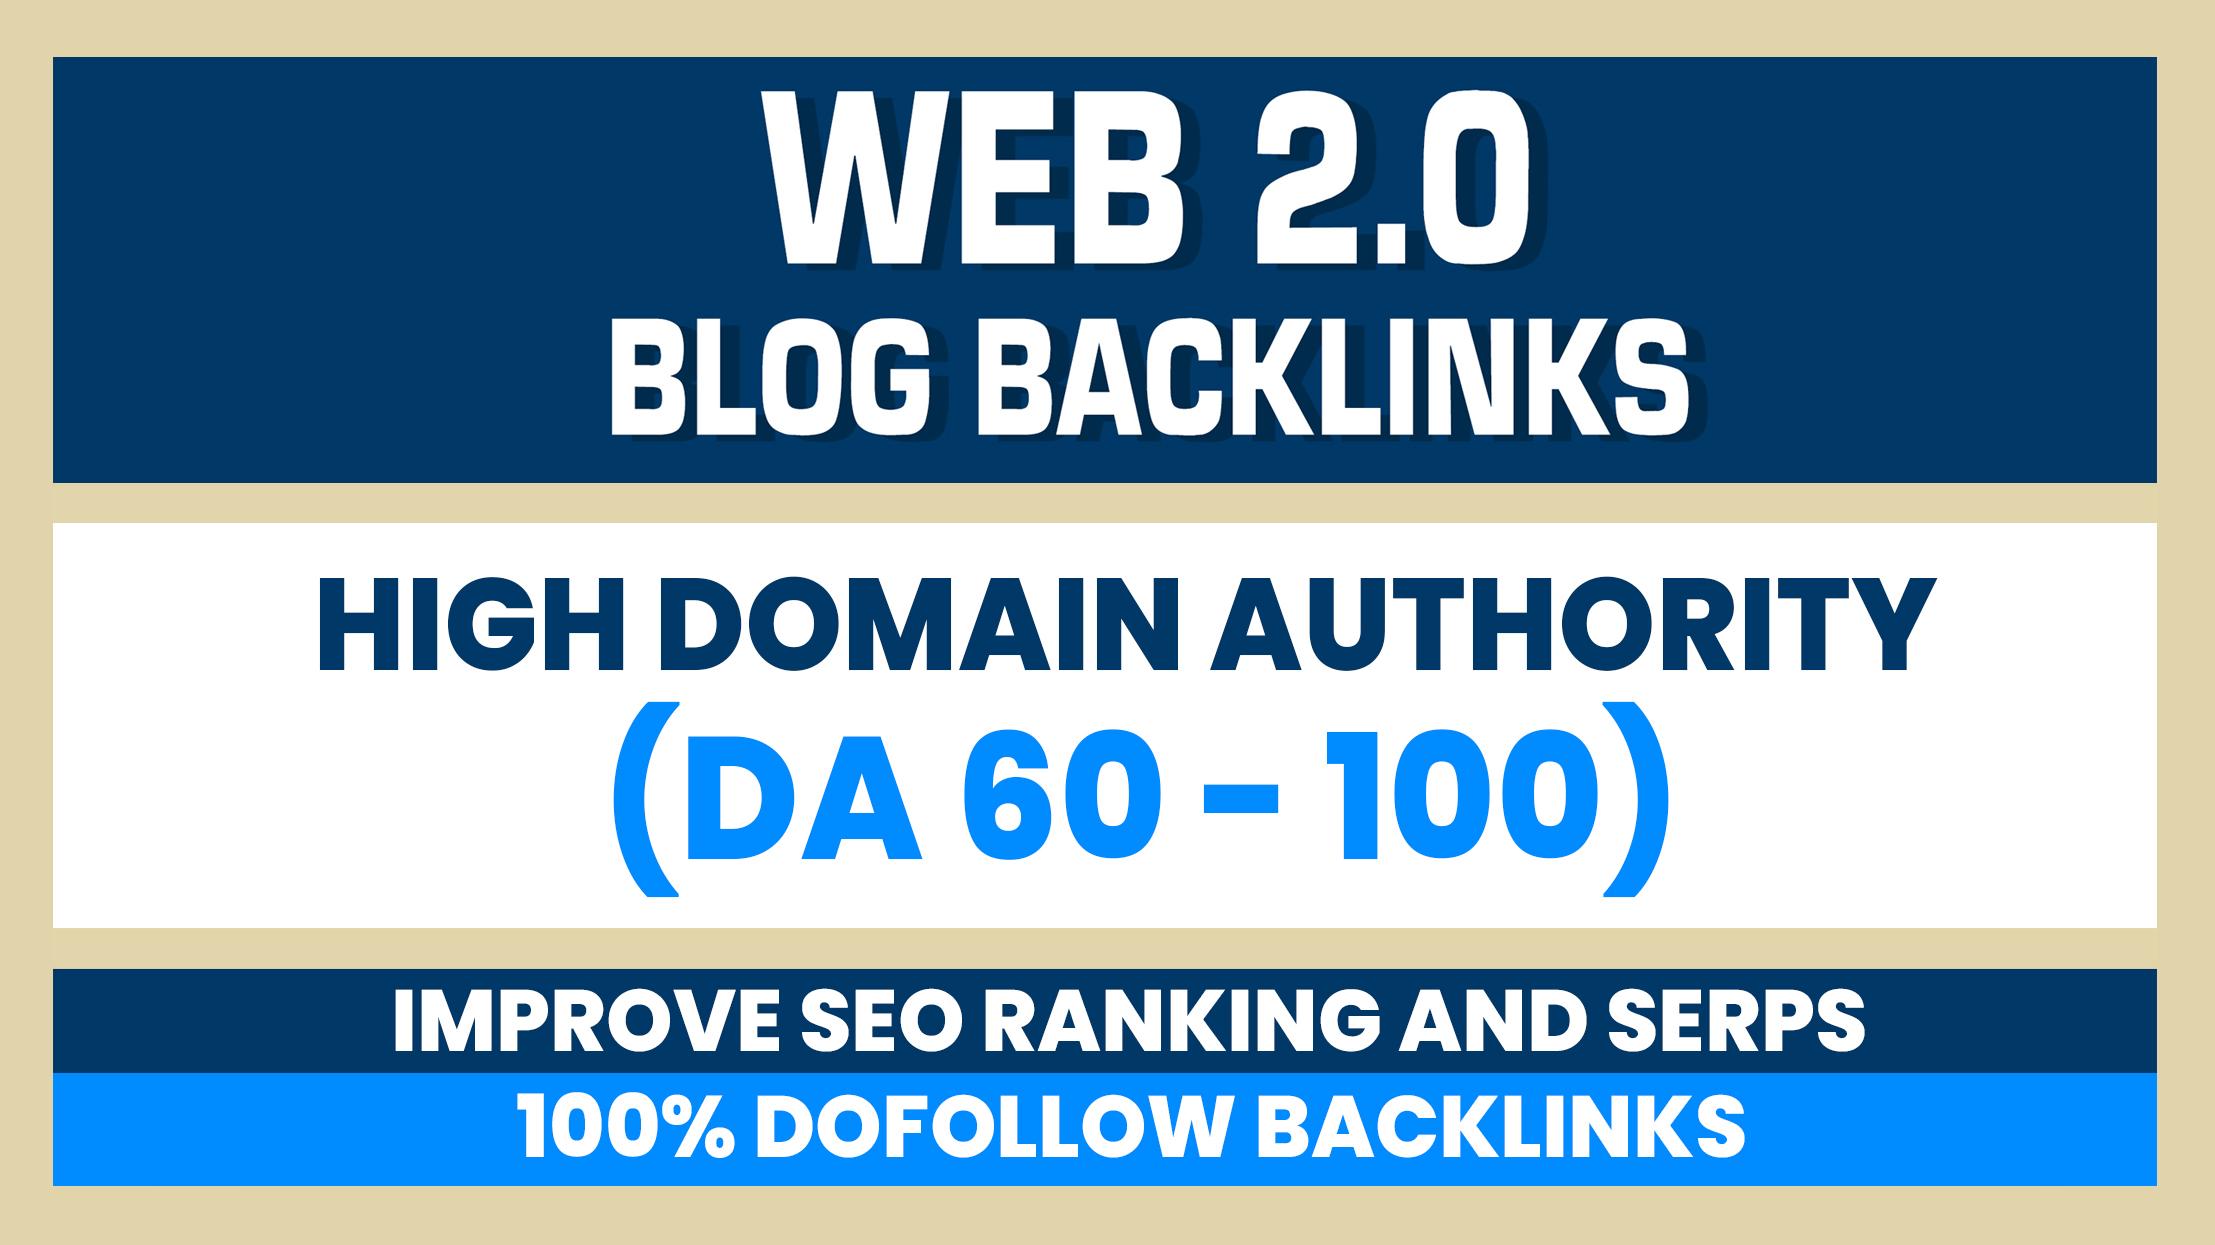 Build 10 Web 2.0 DA 60-100 home page blogs post backlinks